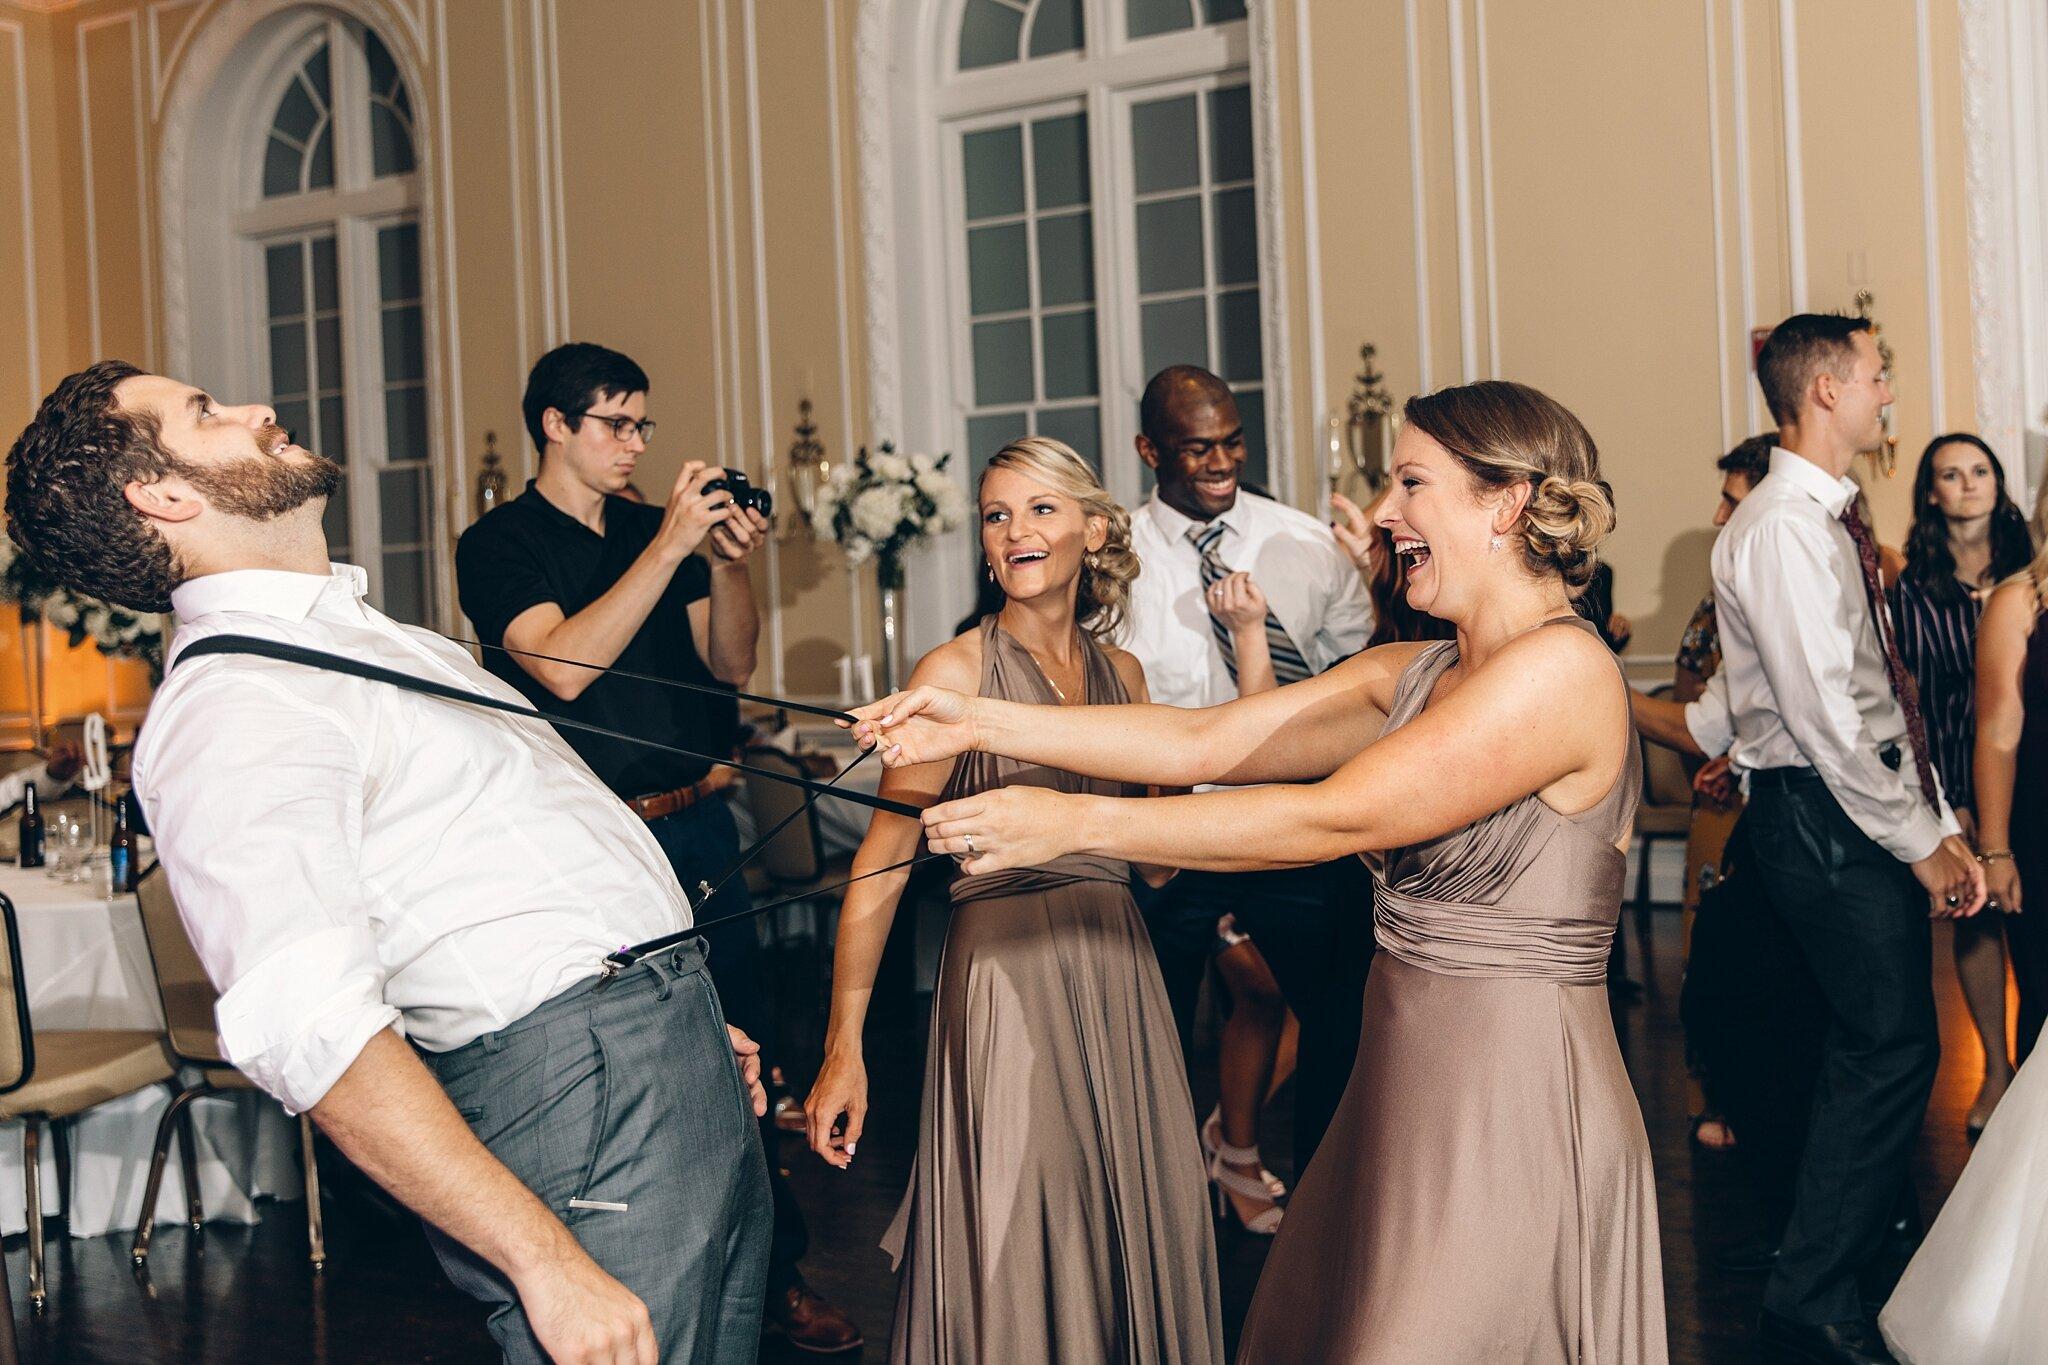 patrick-henry-ballroom-wedding-roanoke_0569.jpg